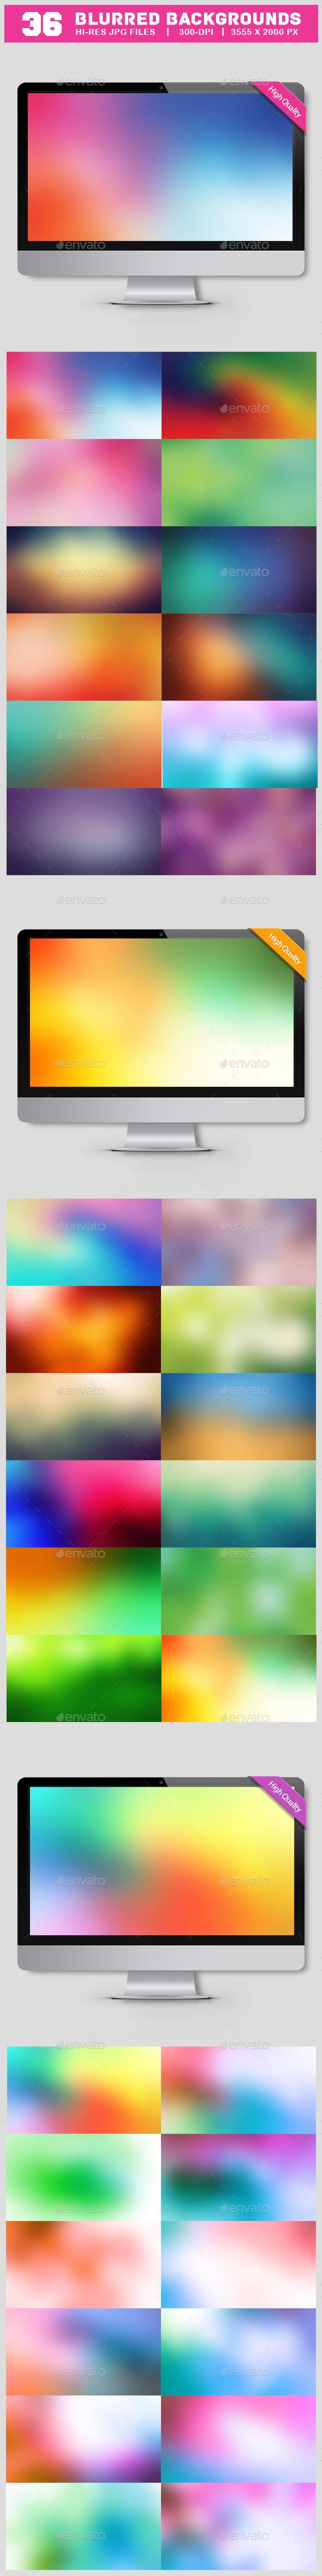 36 Blurred Backgrounds Bundle - Backgrounds Graphics